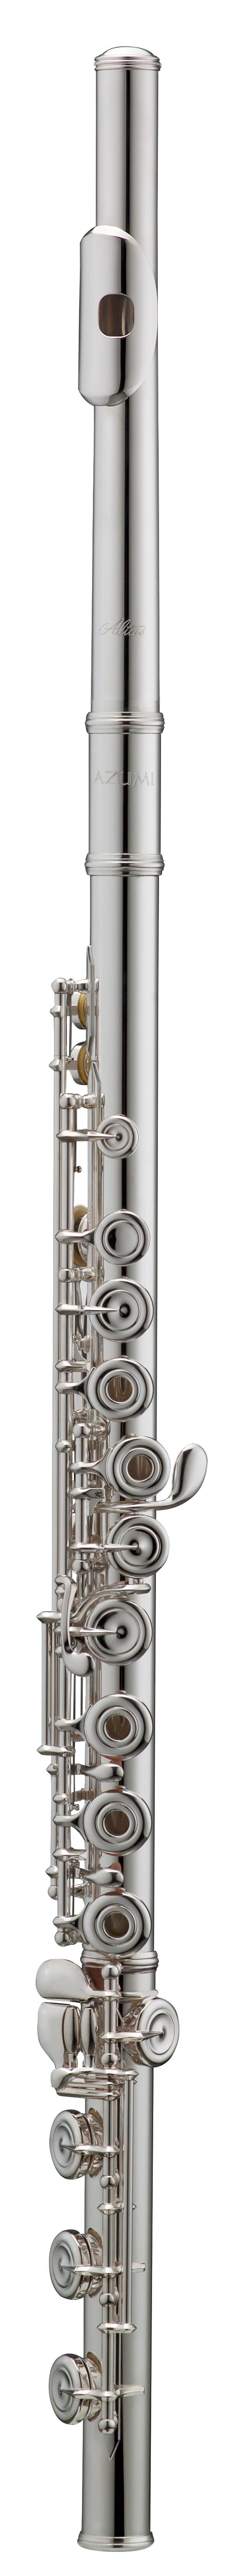 Azumi - AZ - Z1 - RBEO - Holzblasinstrumente - Flöten mit E-Mechanik | MUSIK BERTRAM Deutschland Freiburg